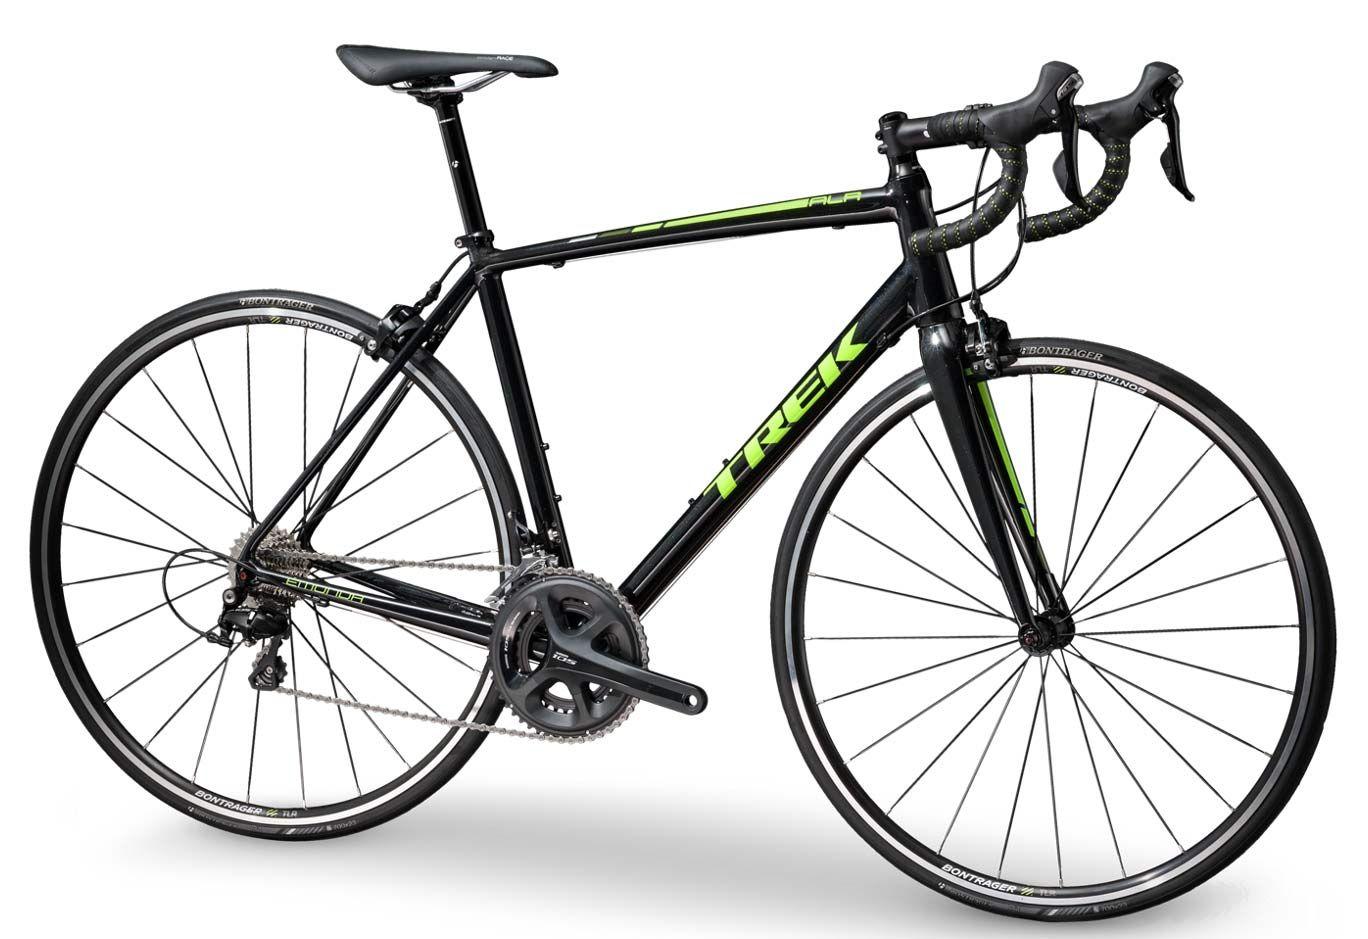 All New Trek Emonda Alr Takes Lightweight Frame Tech To Alloy Models Bikerumor Road Racing Bike Road Bikes Carbon Road Bike